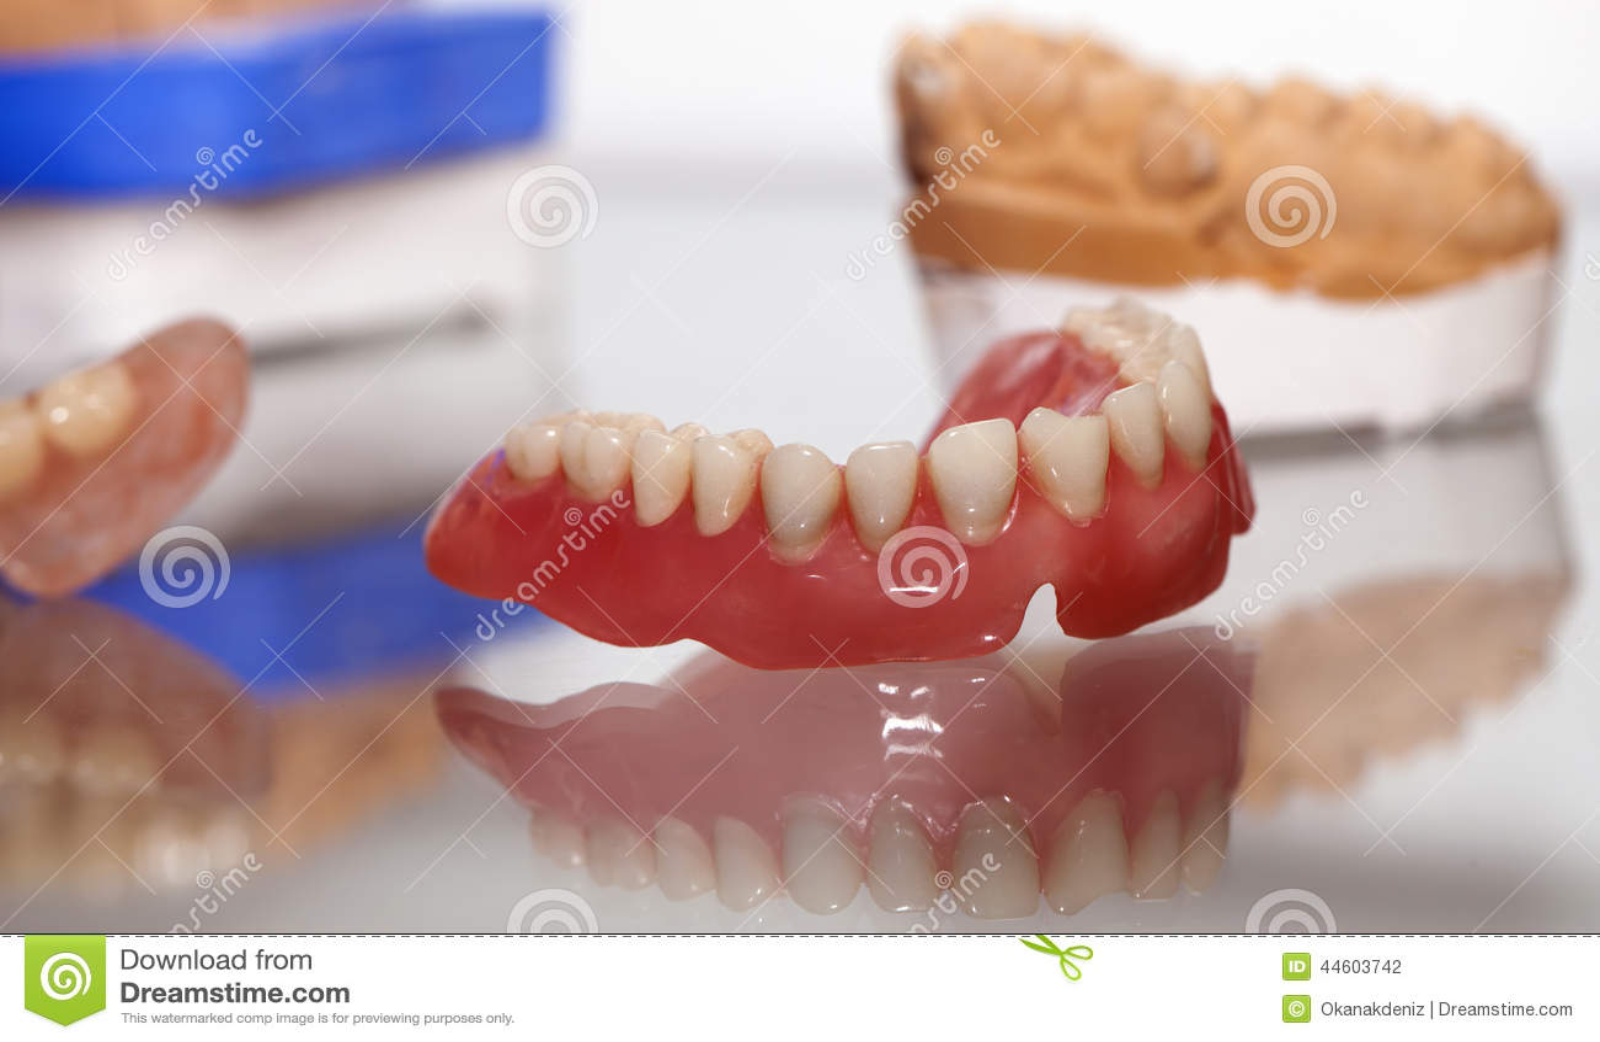 Zirkonium-Porzellan-Zahnplatte im Zahnarzt Store